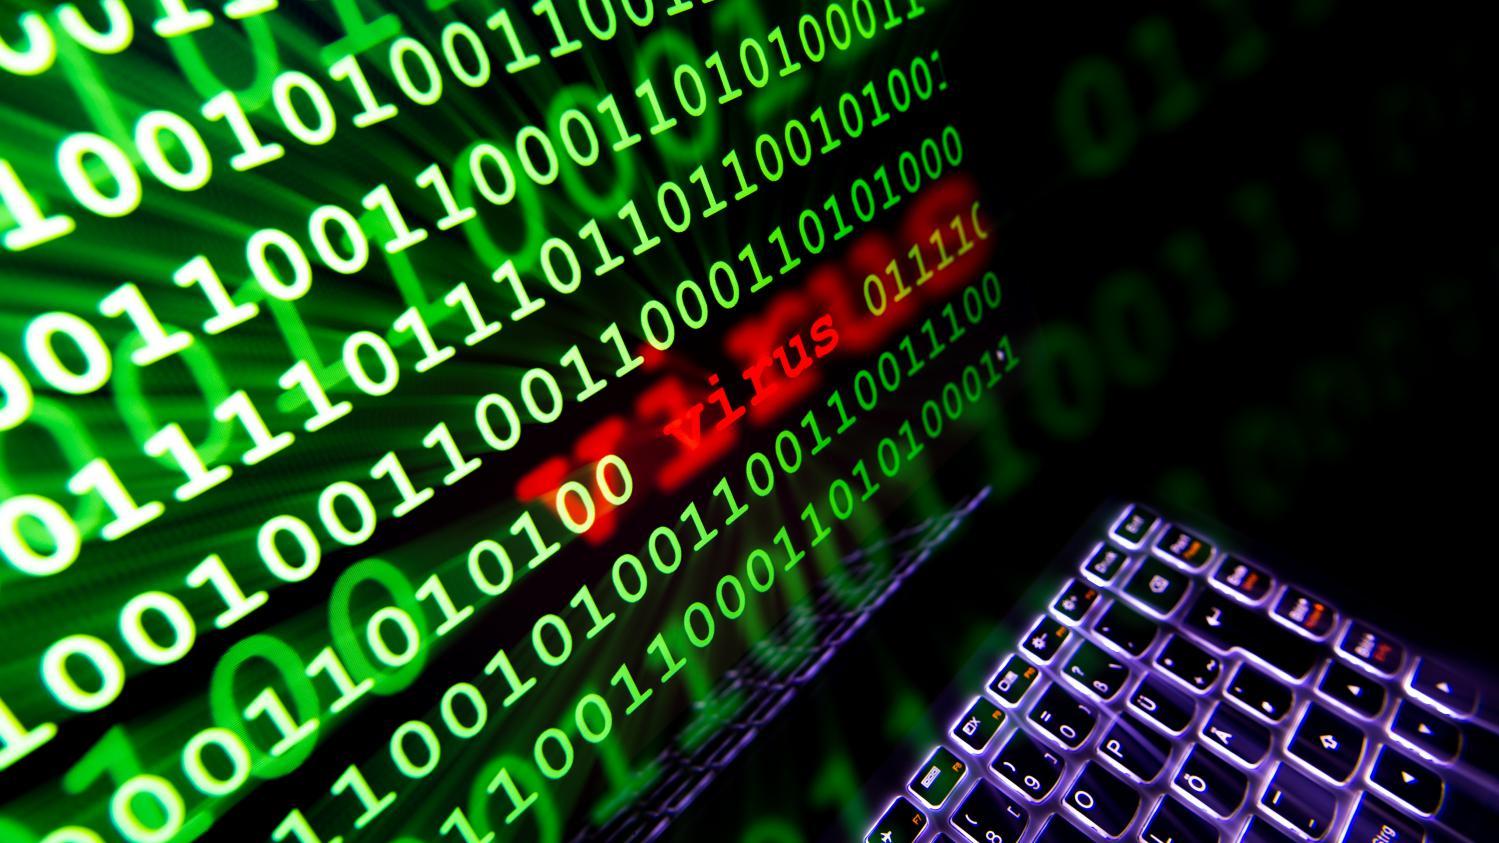 Cinq Questions Sur La Cyberattaque Mondiale Qui Touche